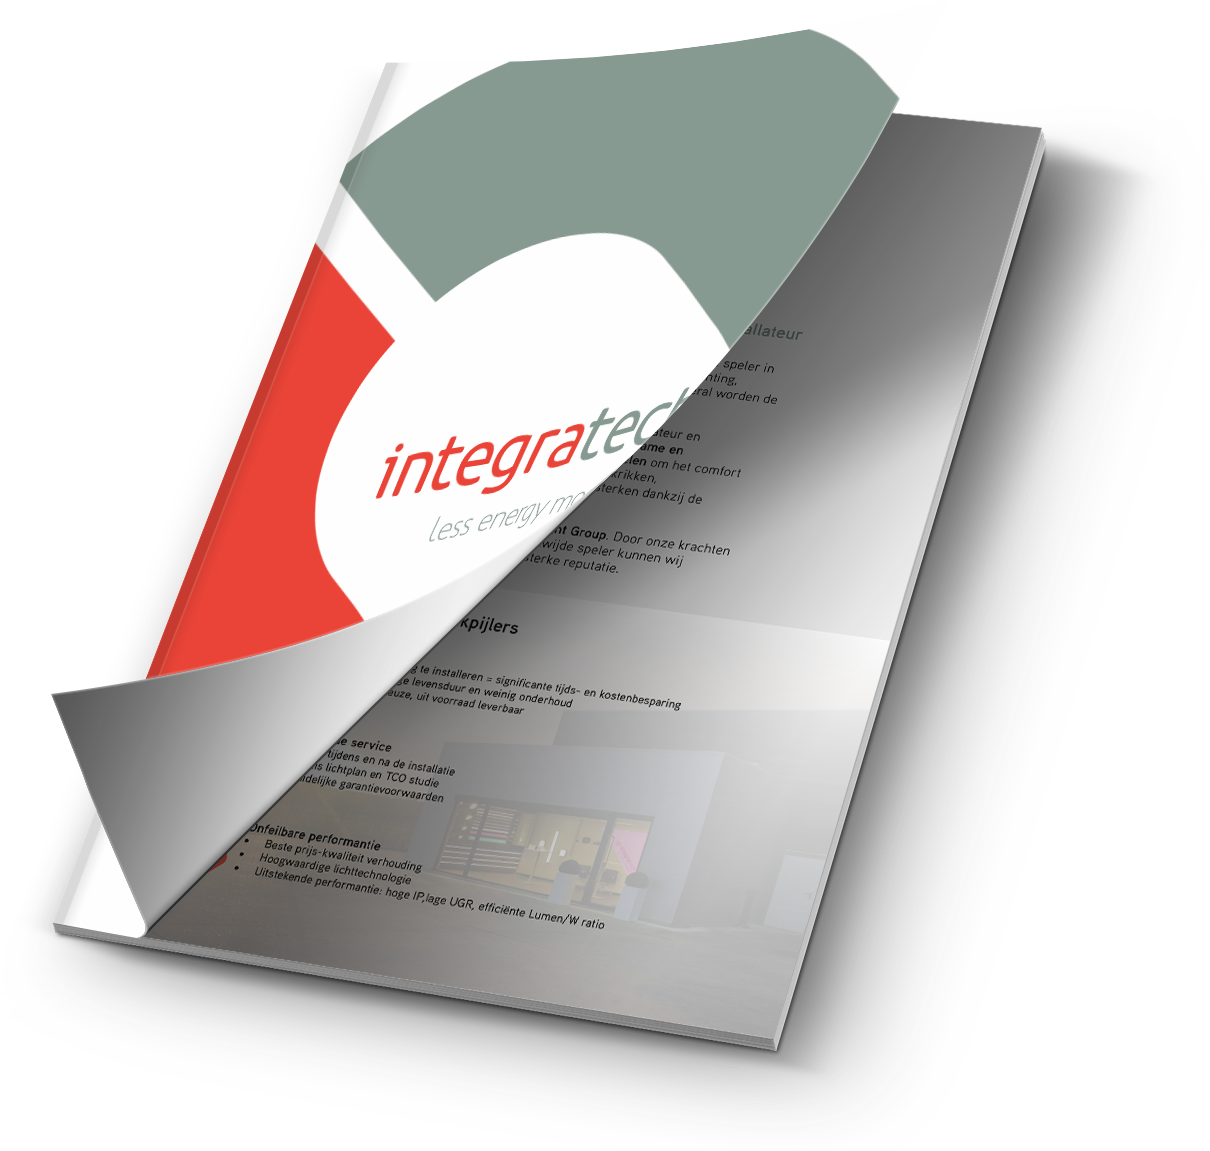 Integratech catalogus